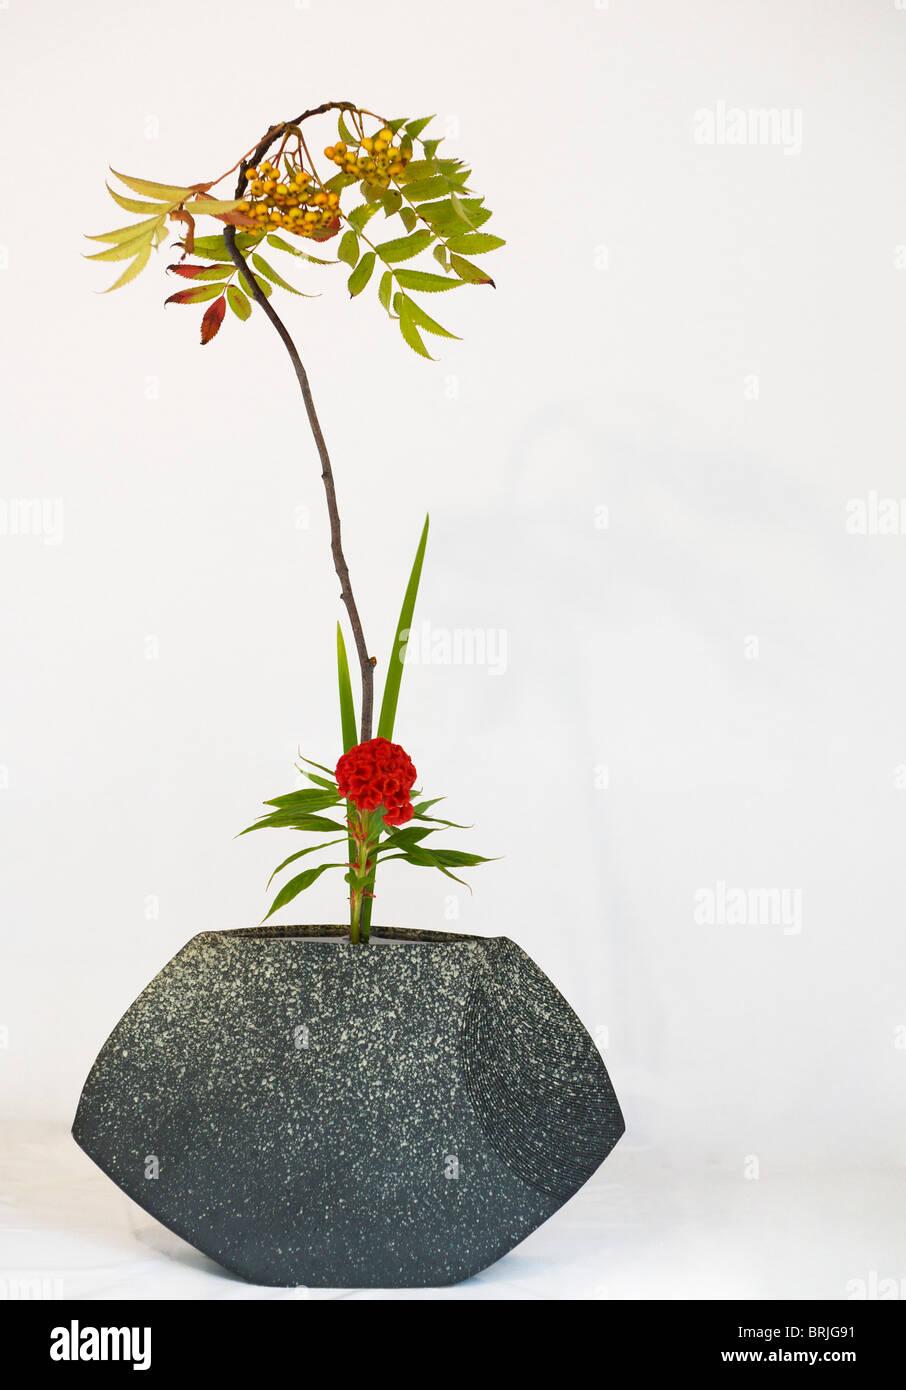 Ikebana stockfotos ikebana bilder alamy for Japanische blumenkunst